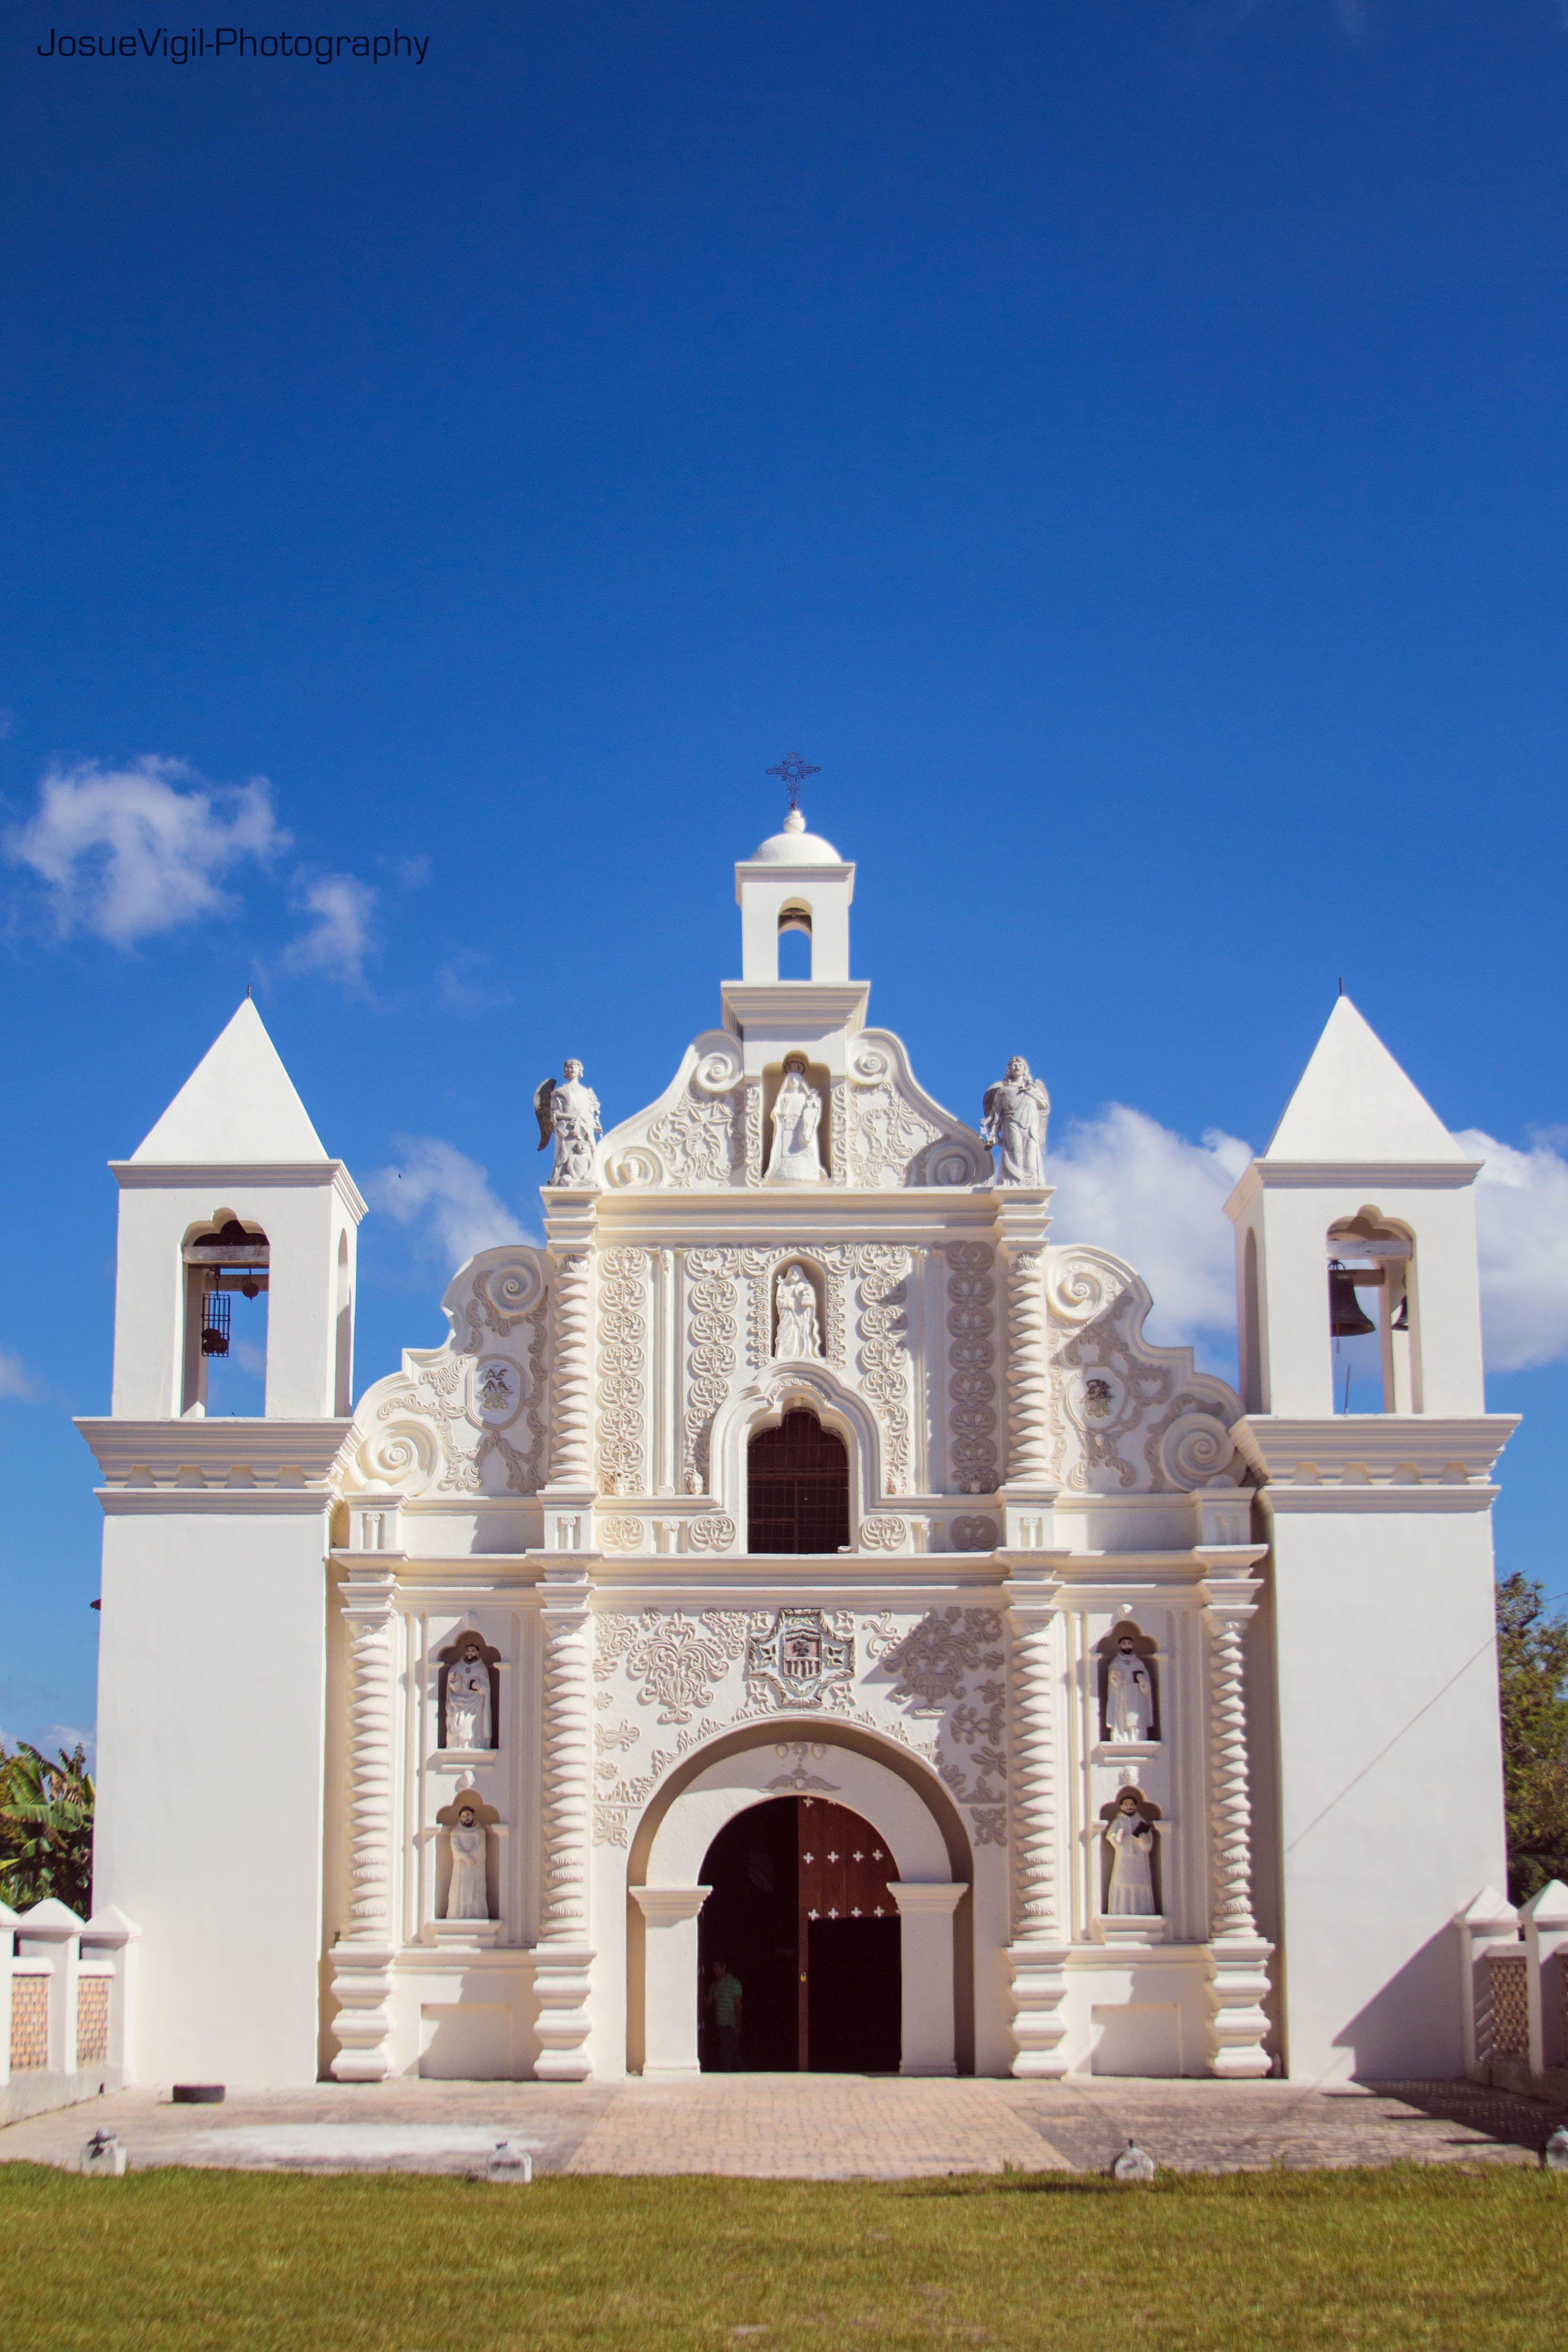 Iglesia La Merced, Gracias Lempira Iglesia, Casitas, Casas